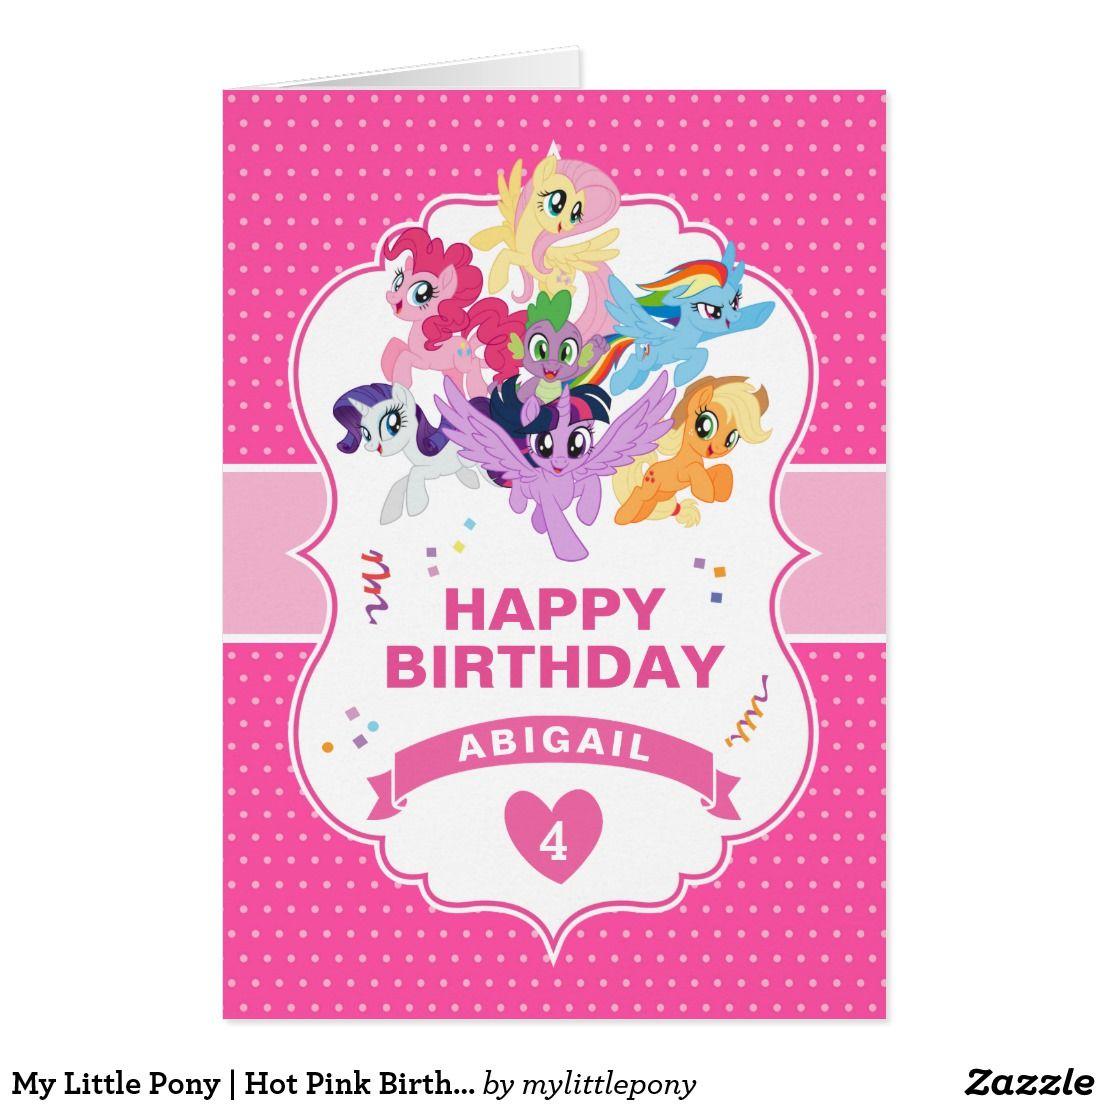 My Little Pony Hot Pink Birthday Card Zazzle Com Hot Pink Birthday My Little Pony Birthday Pink Birthday